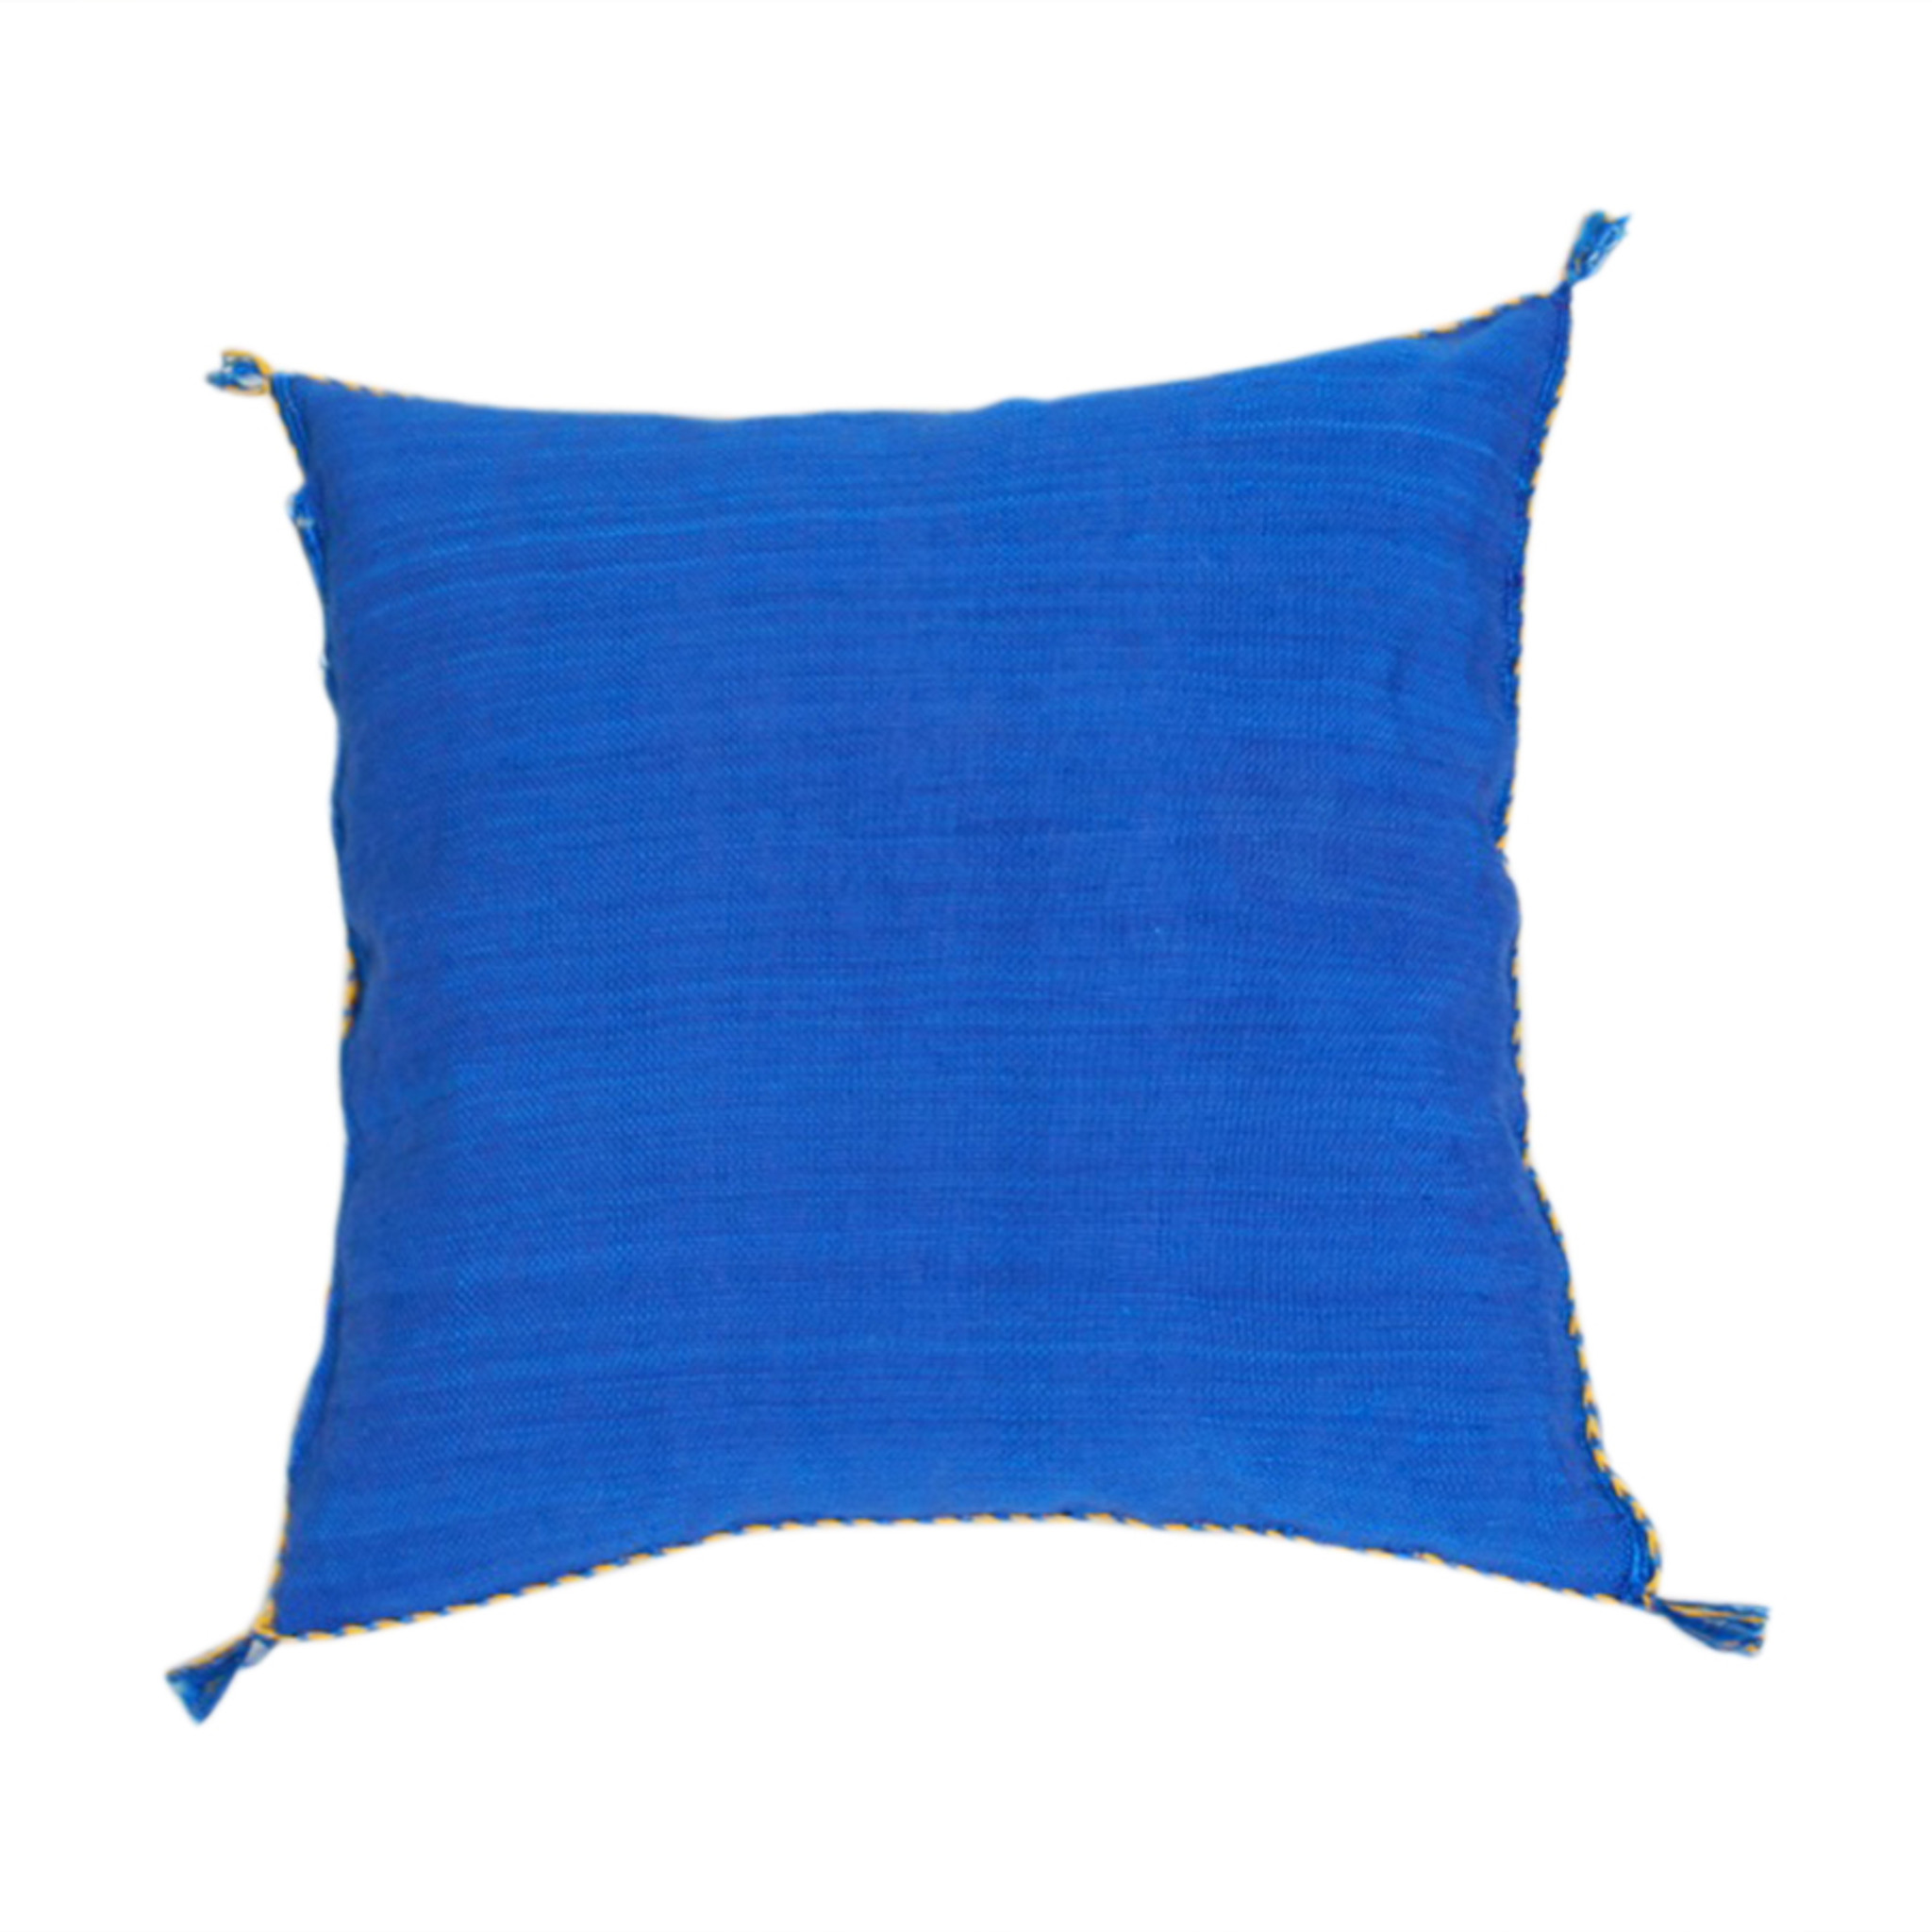 Cerulean Blue Throw Pillows : Sabra Silk Throw Pillow, Moroccan Store Pillow Sheherazade Home